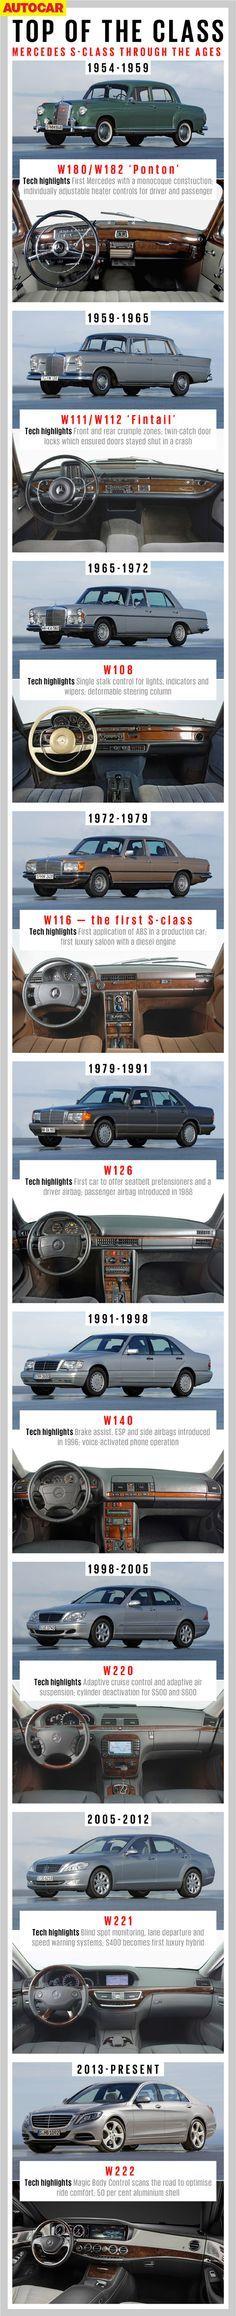 Mercedes Benz S Class History.